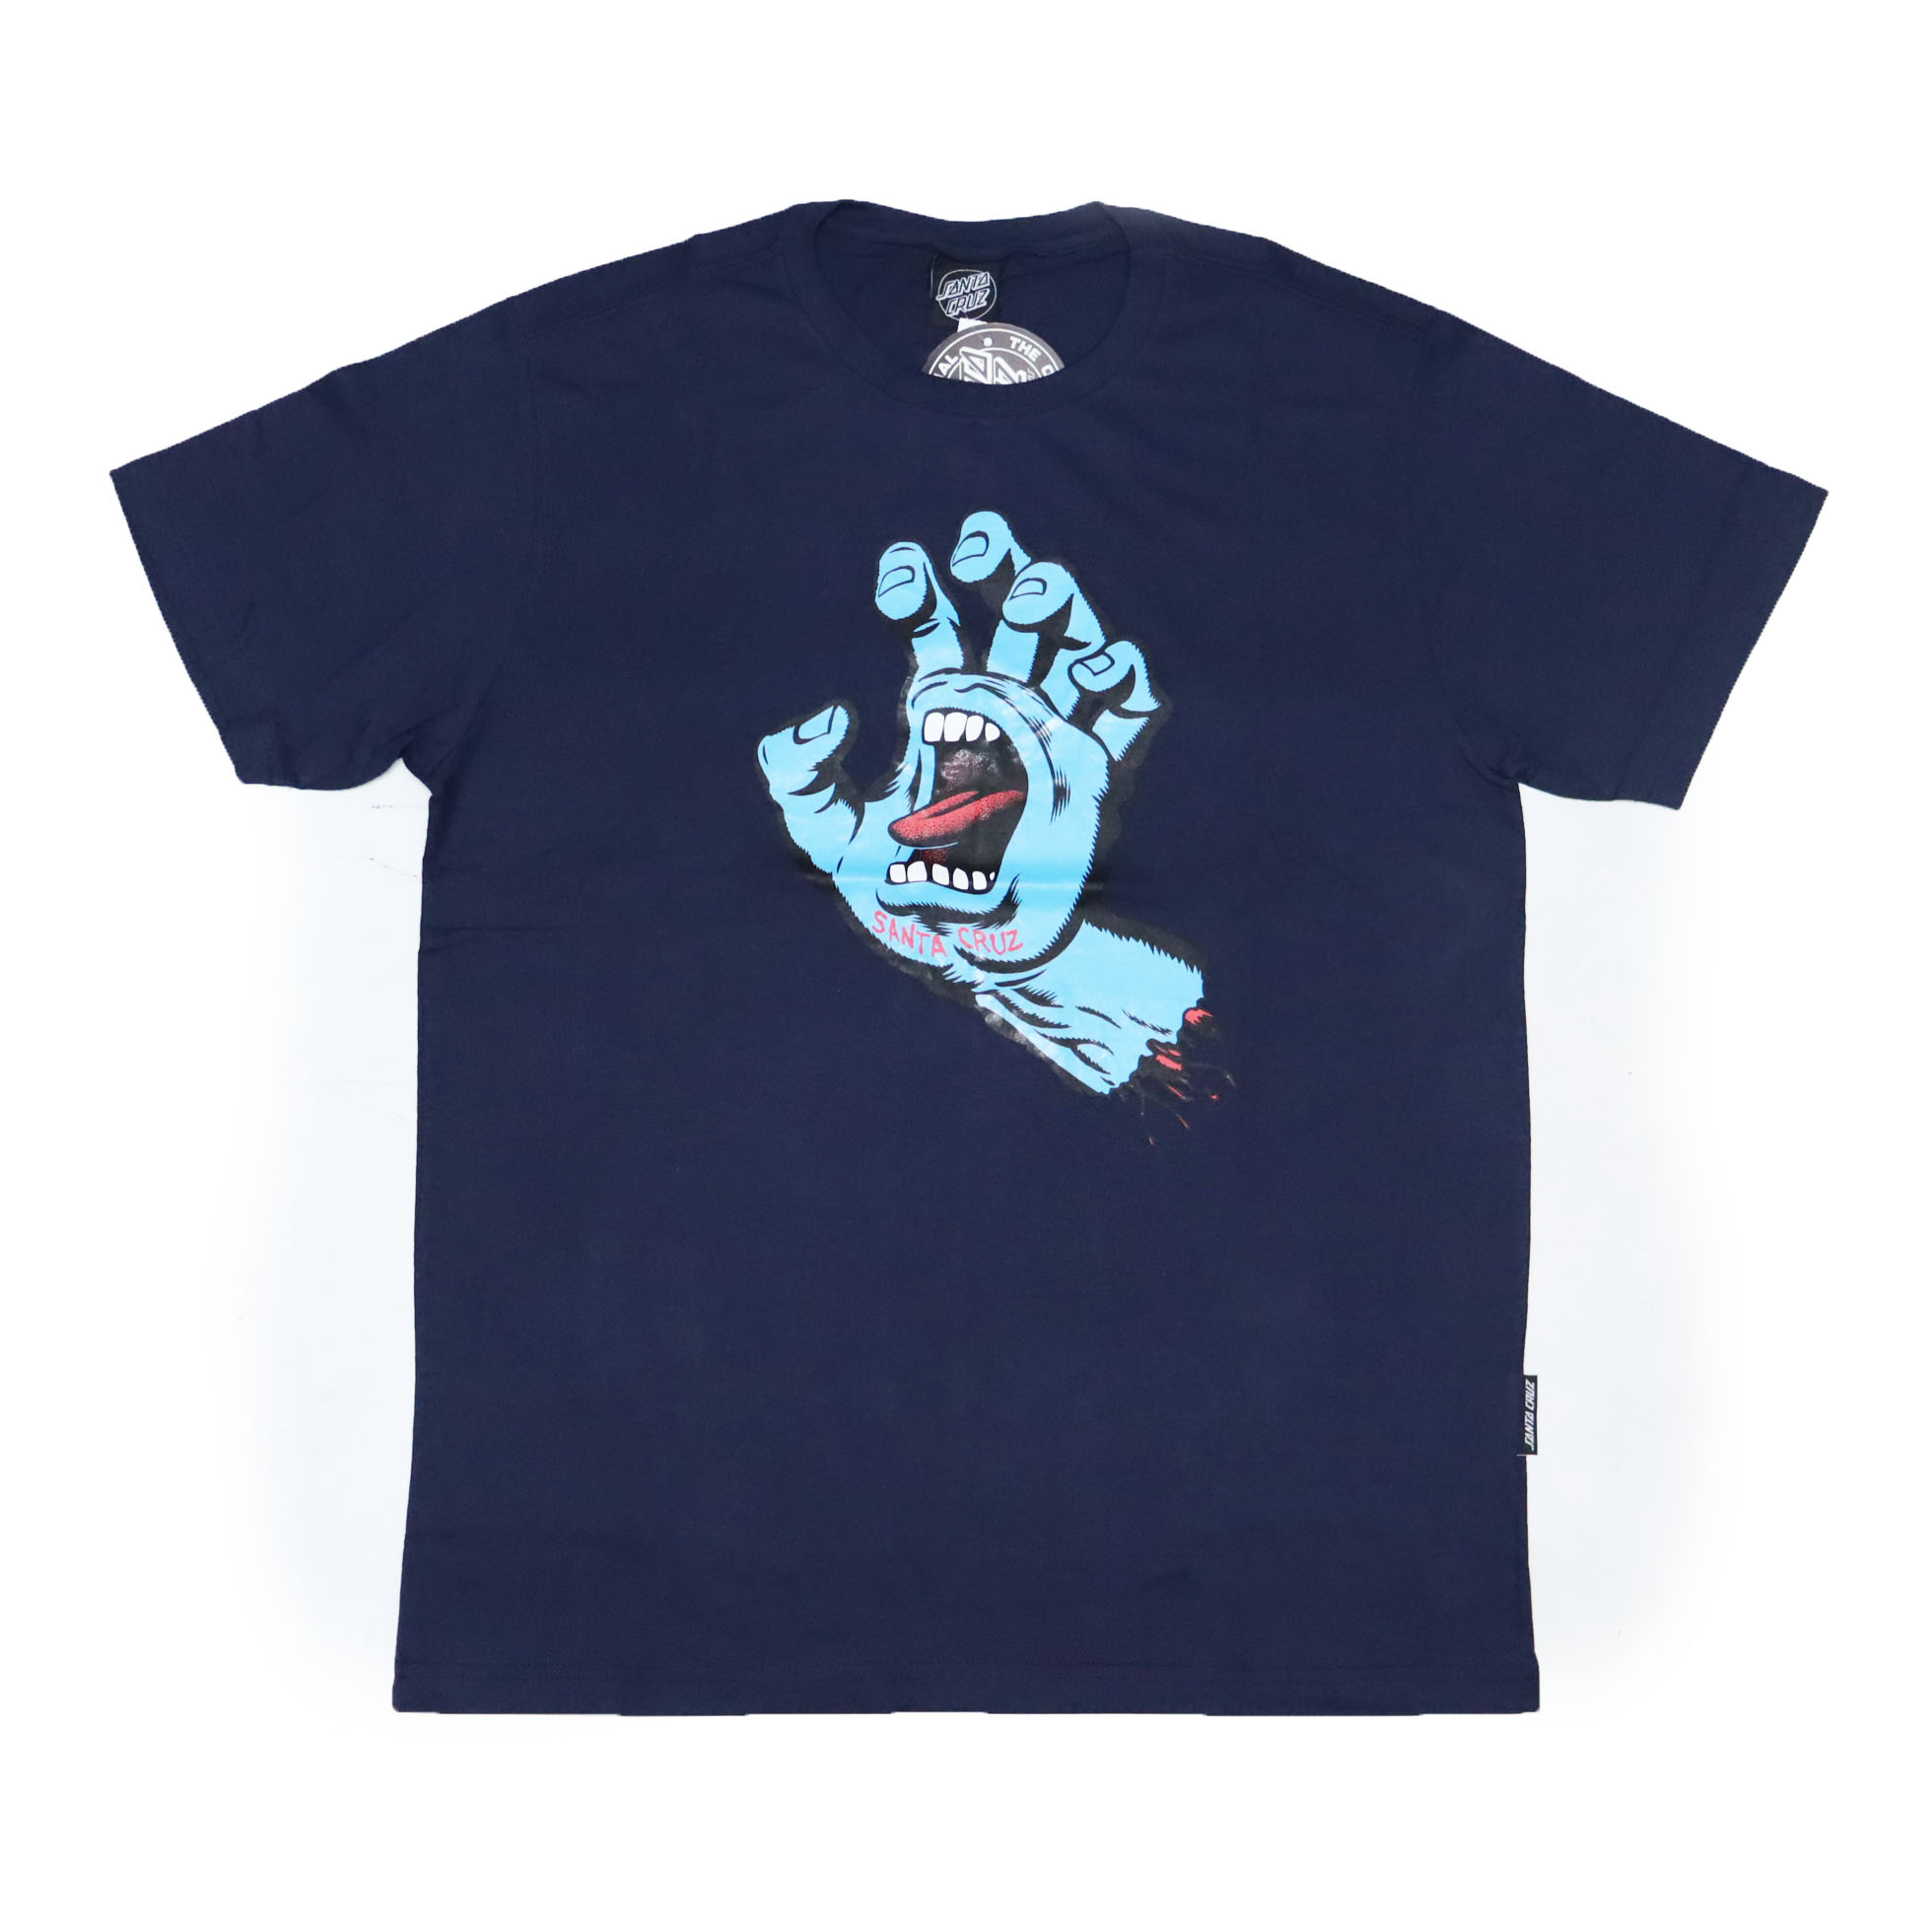 Camiseta Santa Cruz Screaming Hand Front - Azul Marinho/Azul